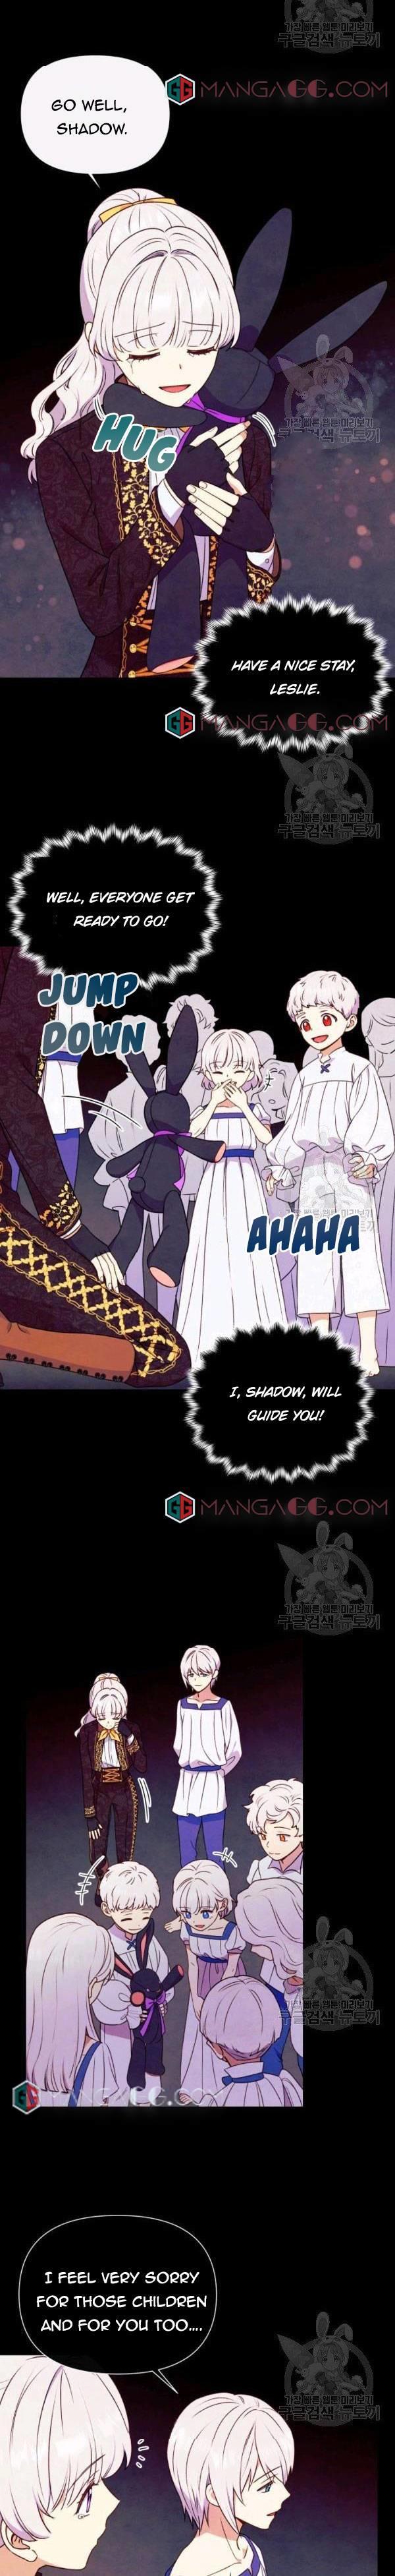 The Monster Duchess And Contract Princess Chapter 121 page 13 - Mangakakalot